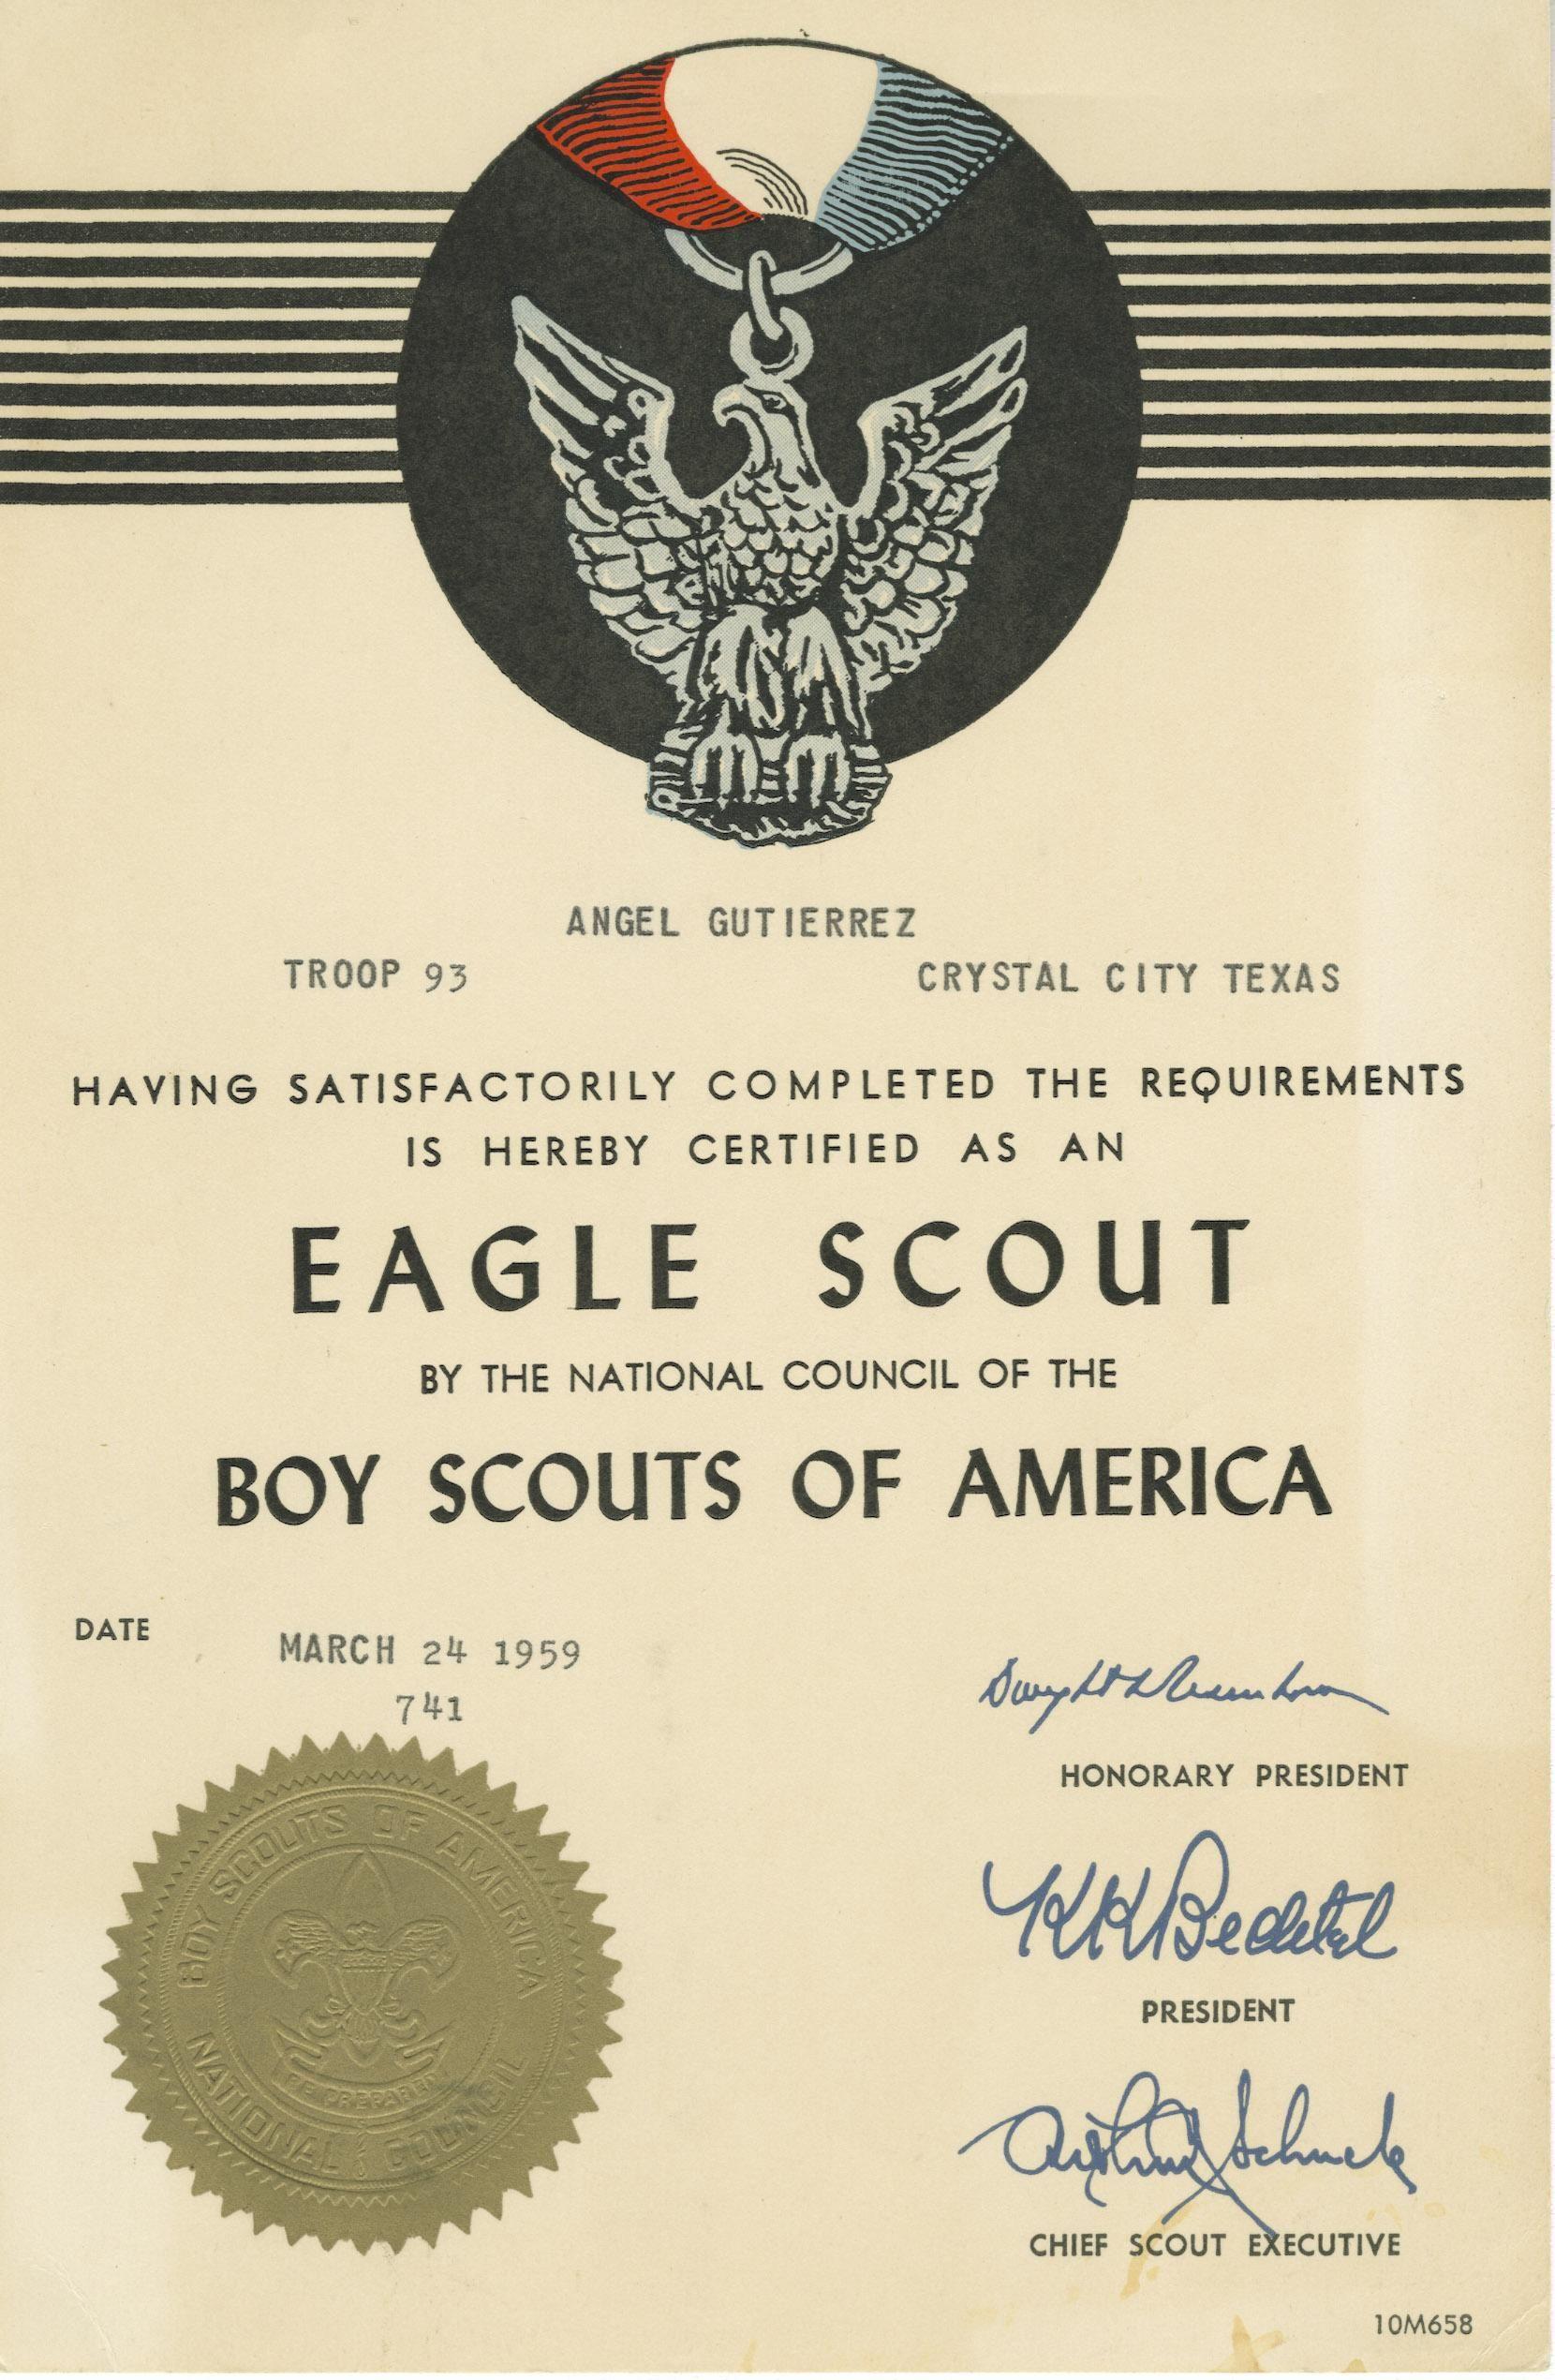 Eagle Scout Certificate Jose Angel Gutierrez Rosita Fernandez Lp